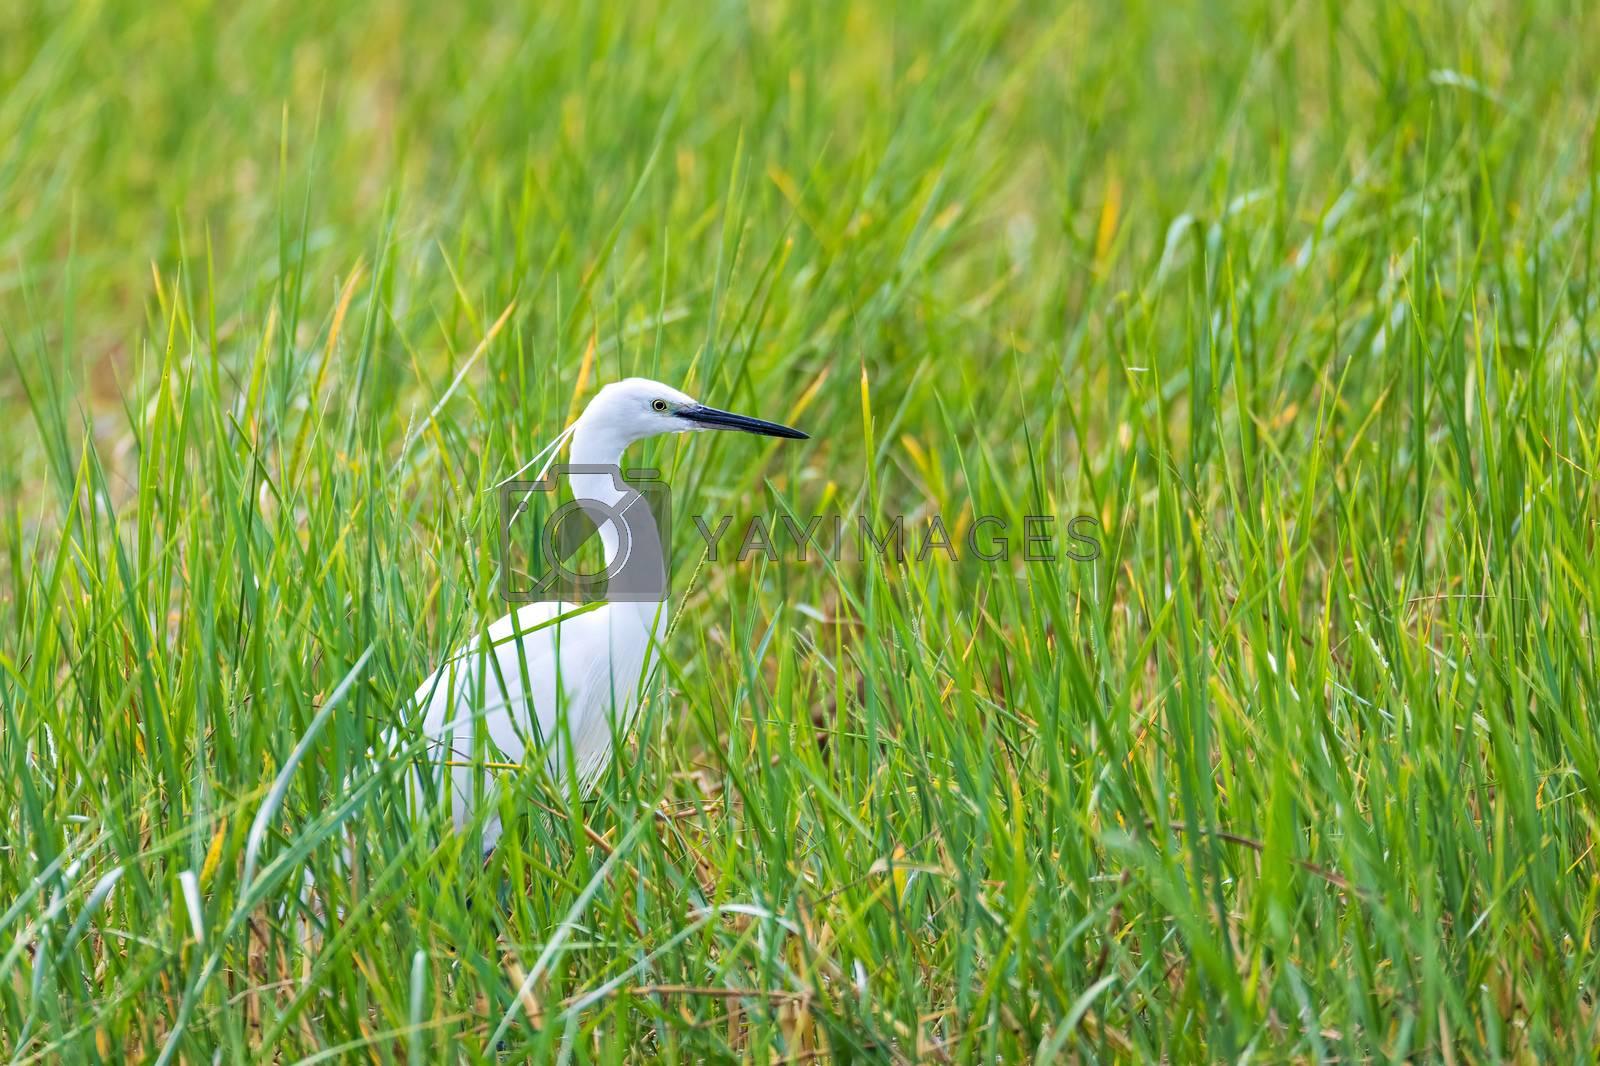 big bird Great white egret in green grass, Ardea alba looking for foor in swamp, Lake Awasa, Ethiopia wildlife